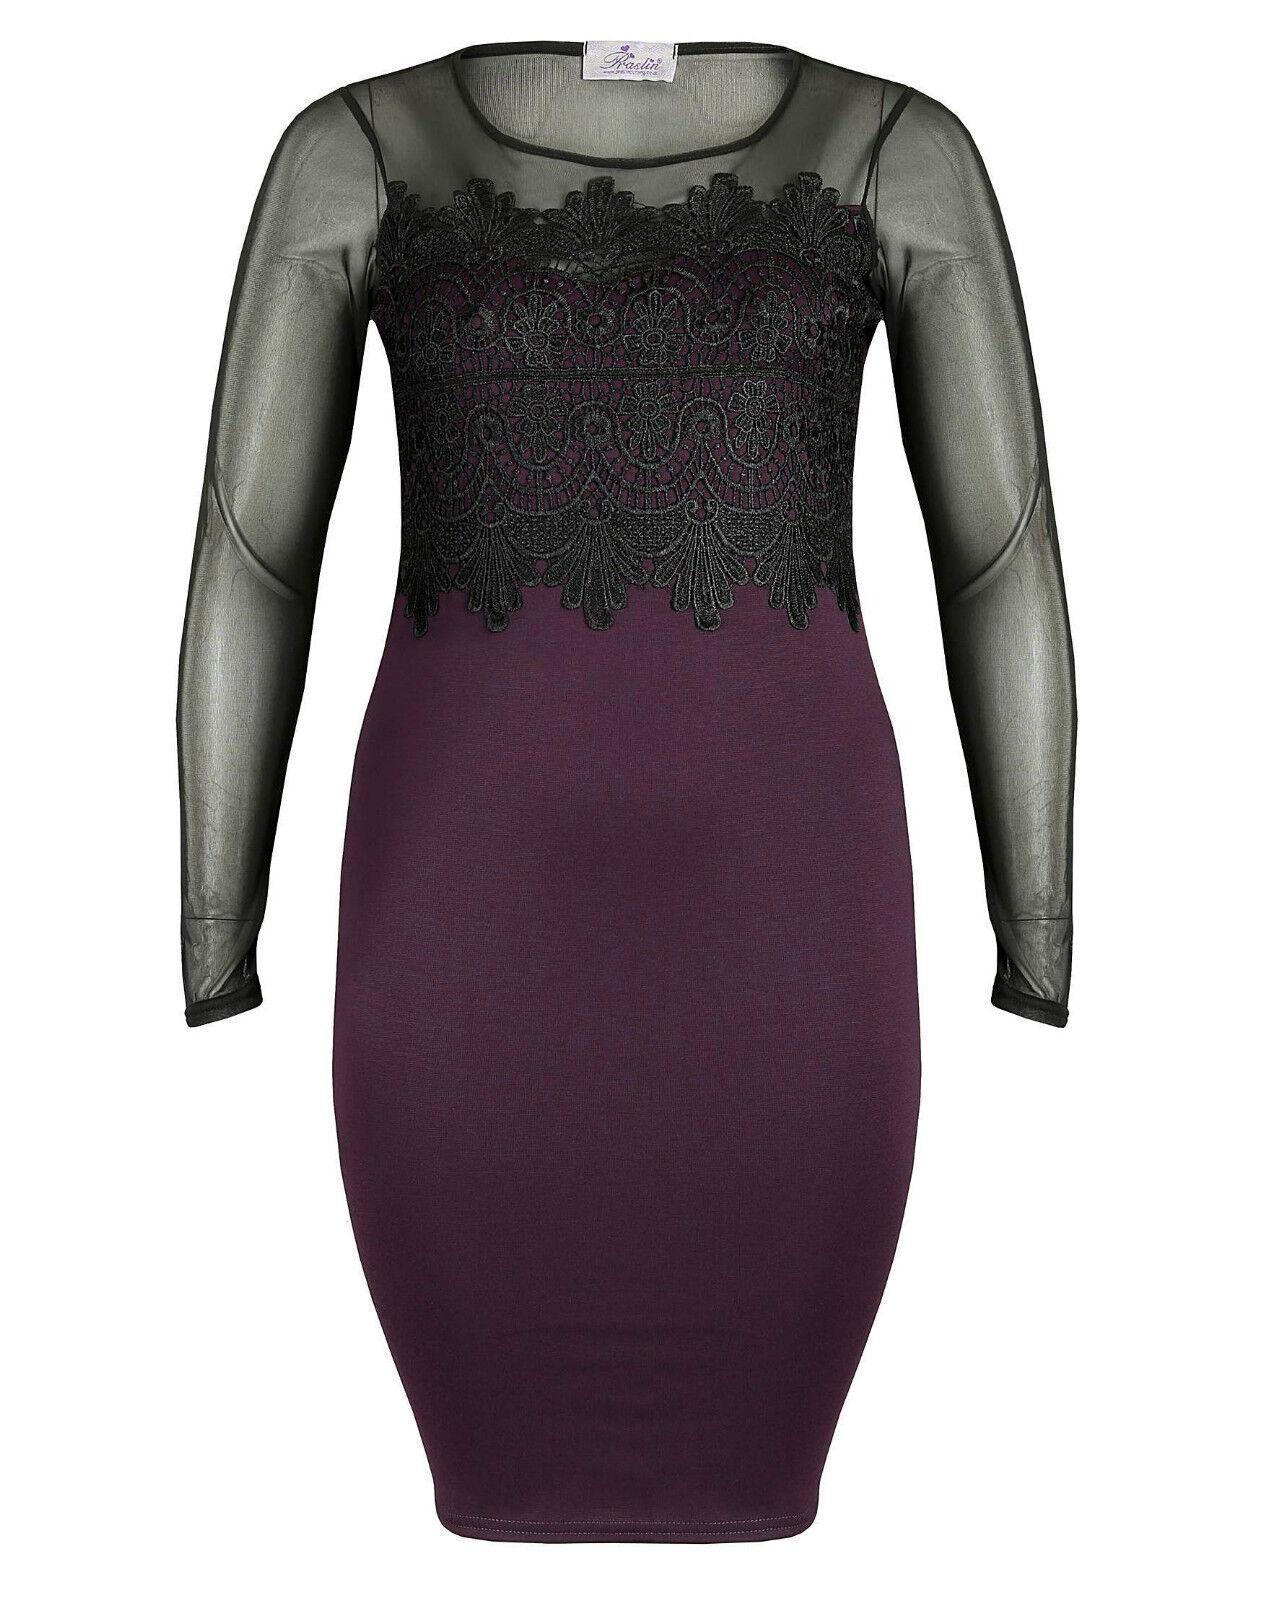 Spitzenkleid Gr.44 Etuikleid Spitze Kleid Lila Neu Langarm Neu Damen festlich